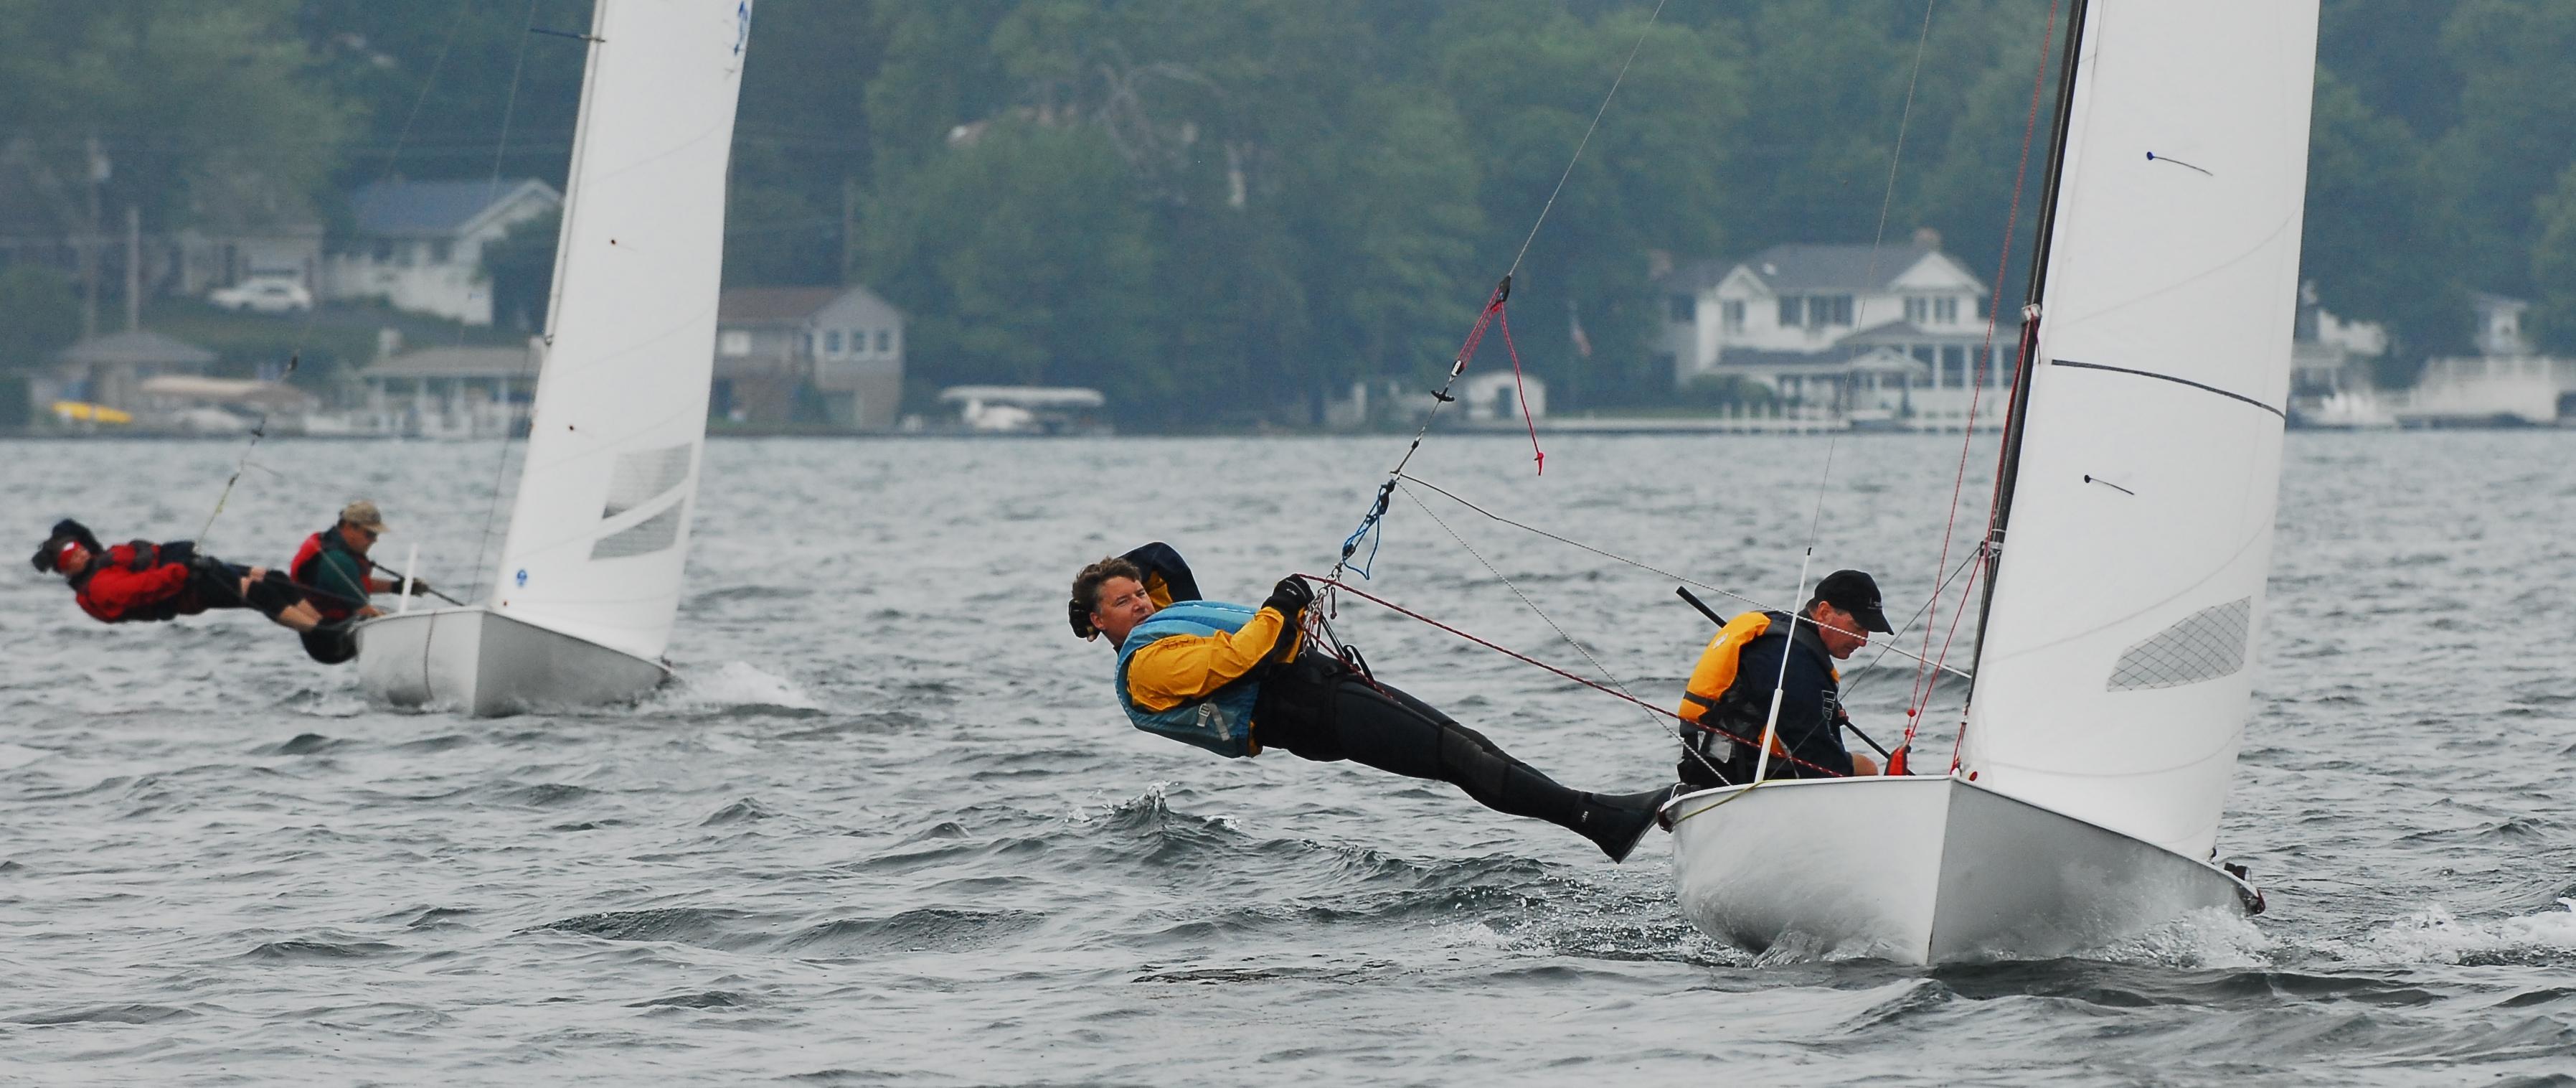 Flying_Dutchmans_NY_2008_trapeze